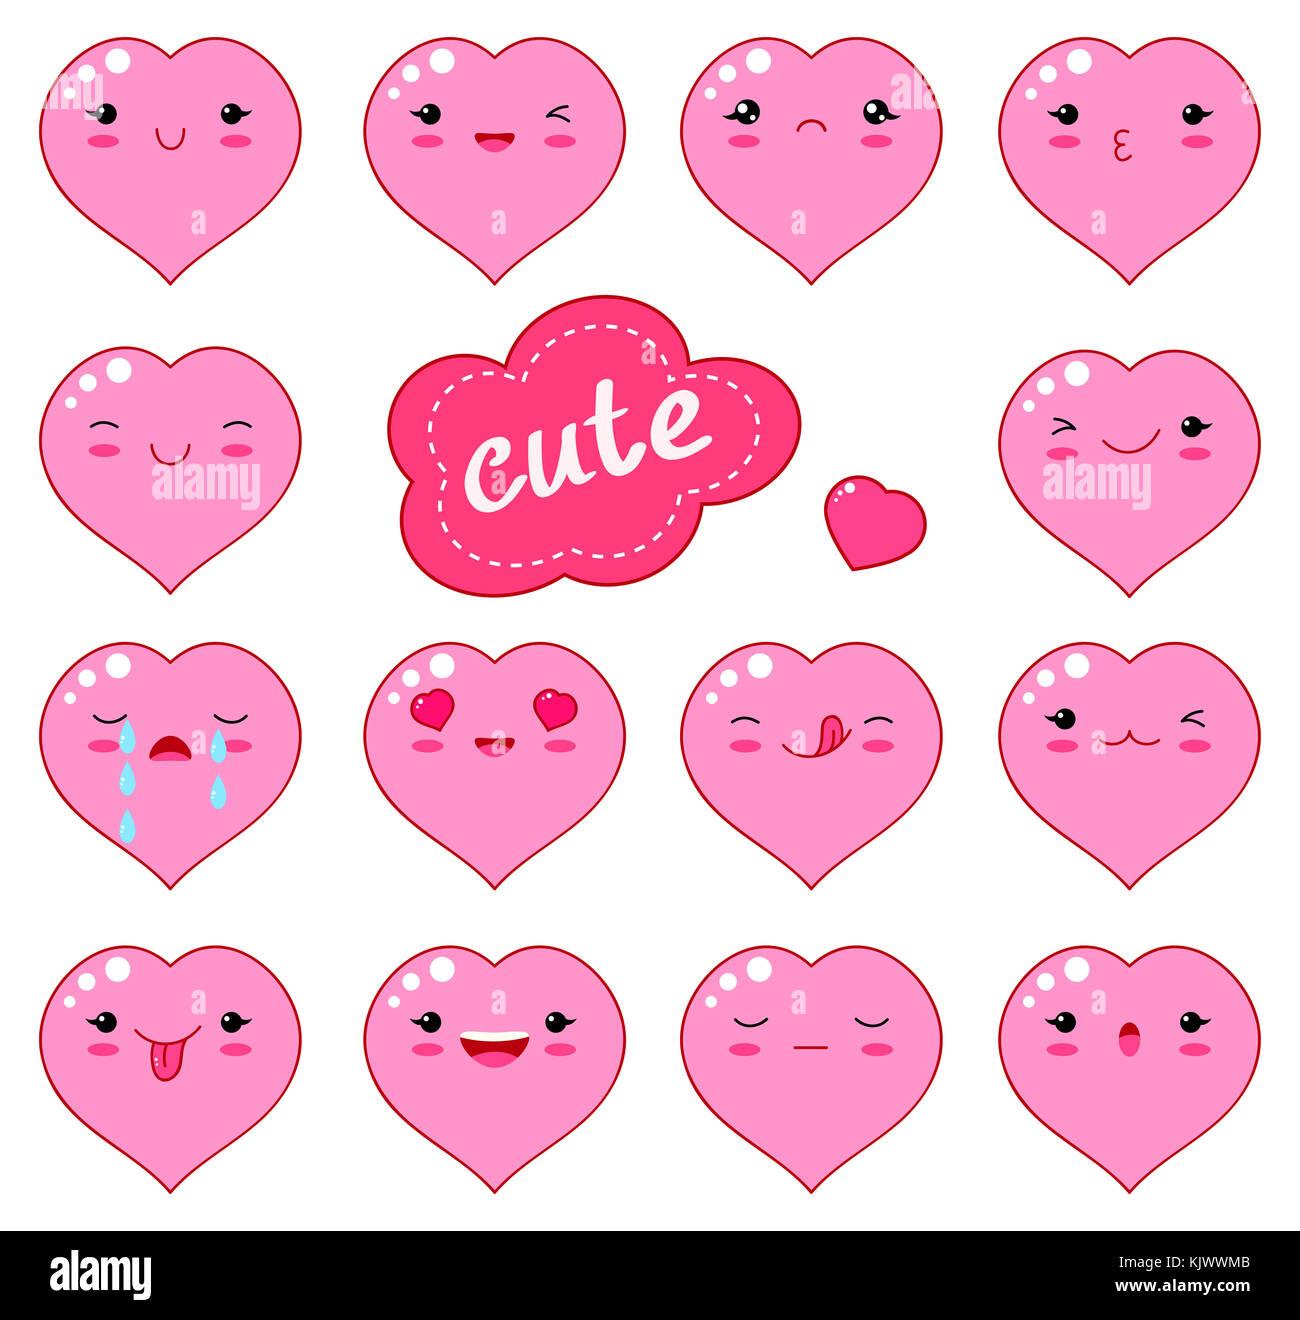 Cute Elephant Design Wallpaper Cute Heart Love Kawaii Character Stock Photos Amp Cute Heart